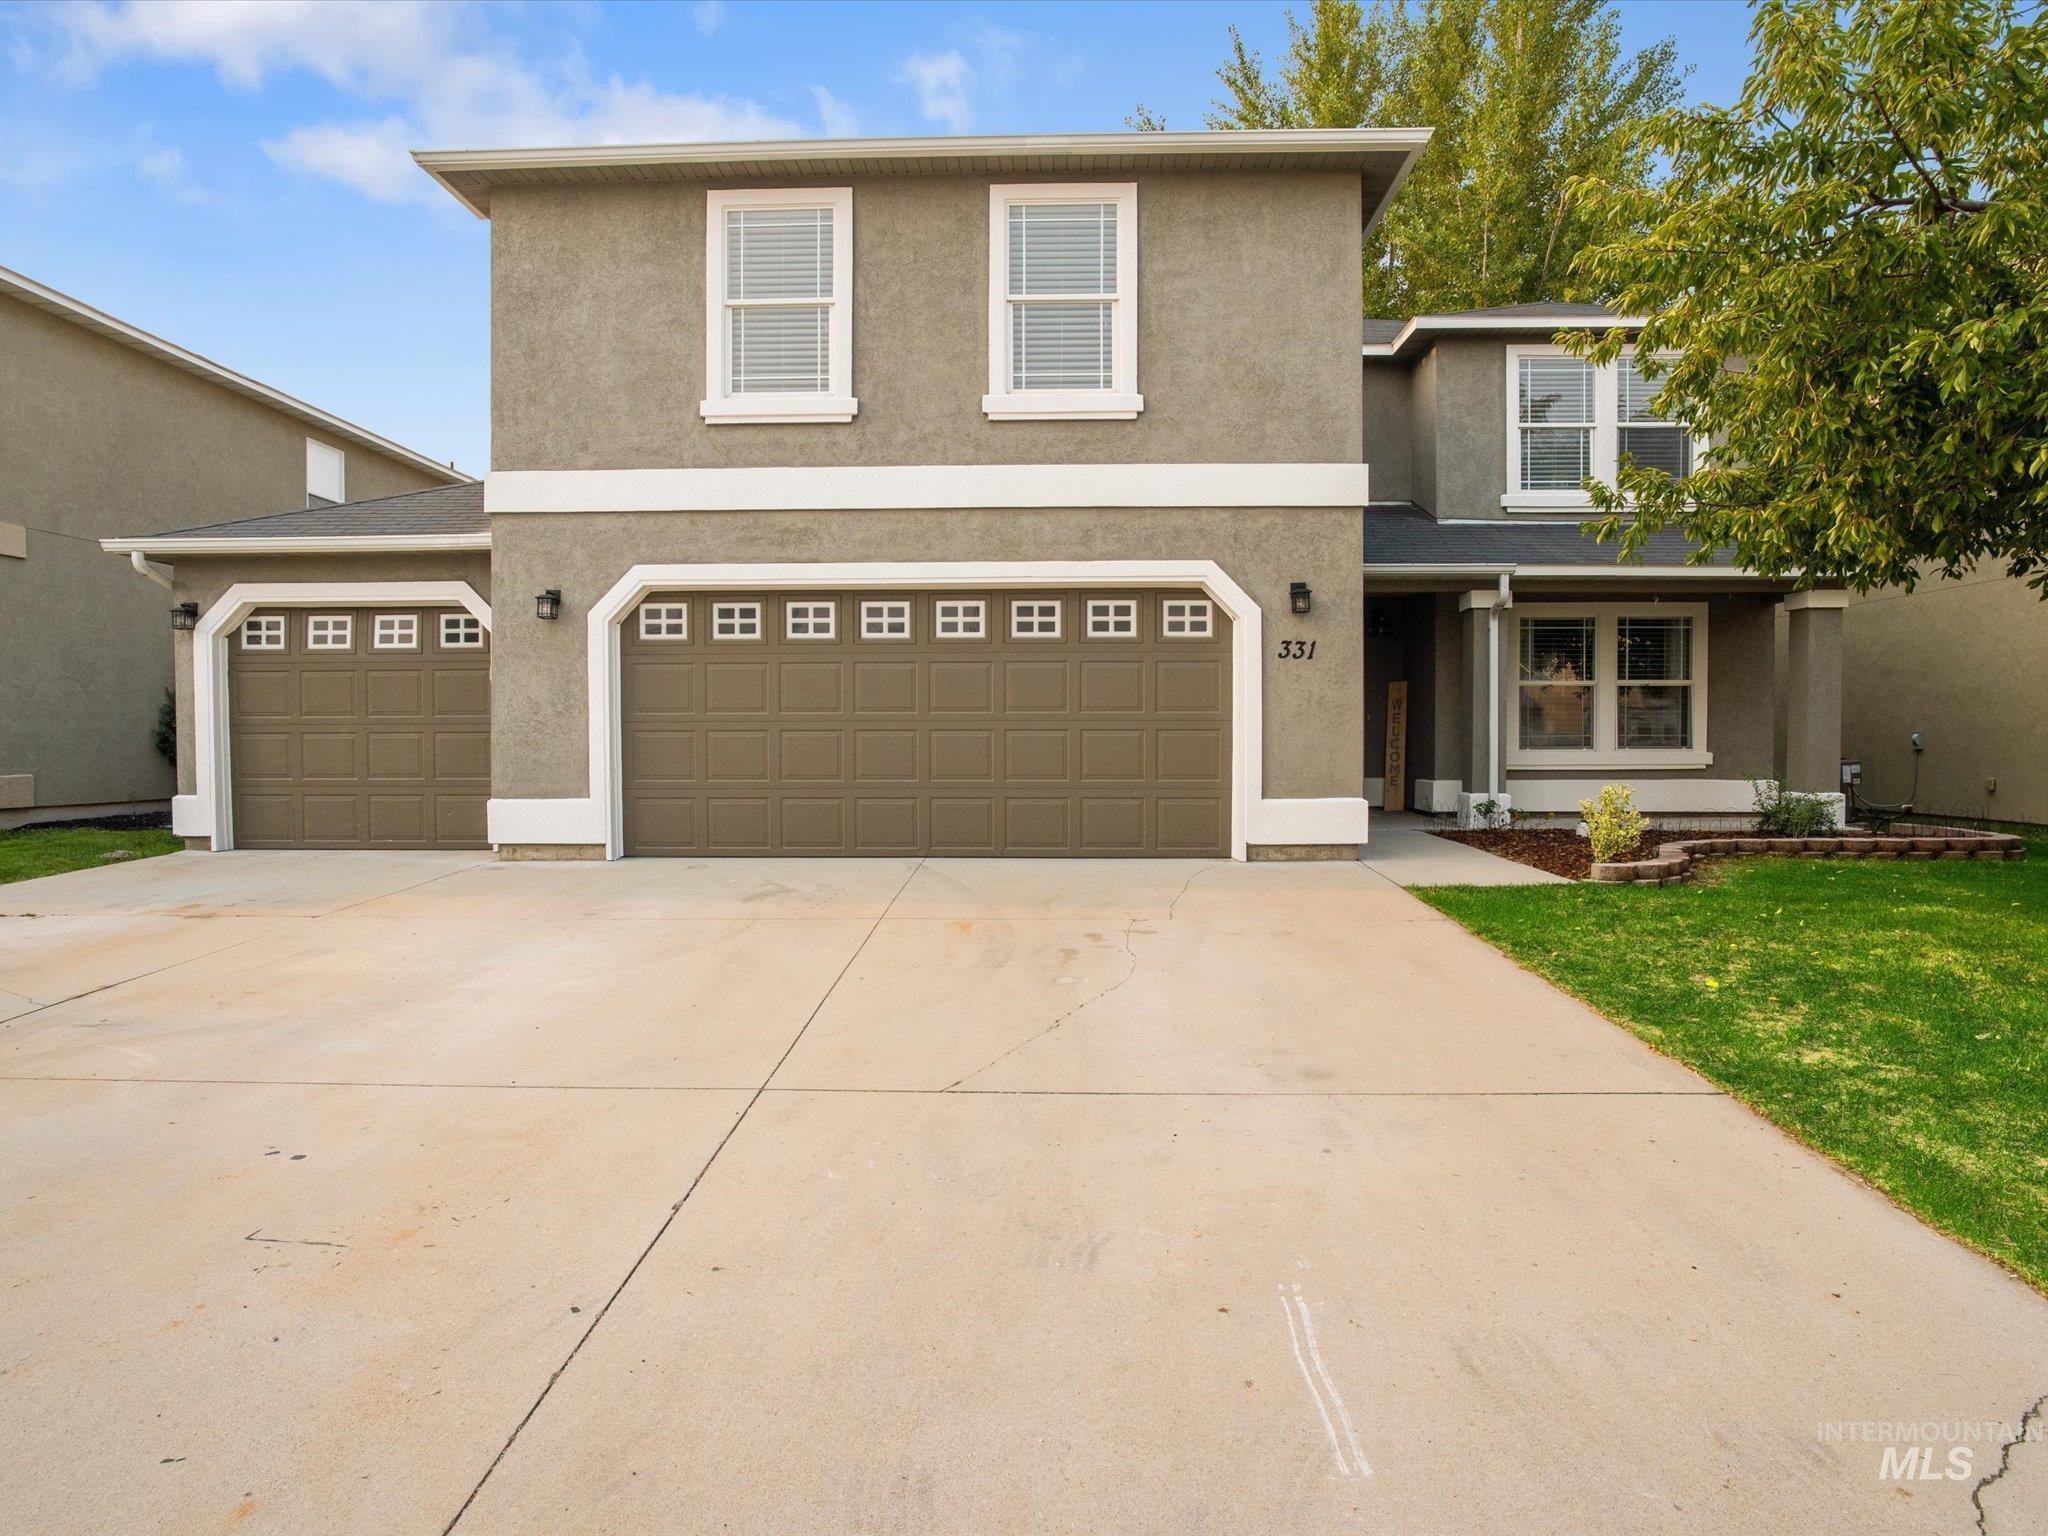 Calico Creek Real Estate Listings Main Image